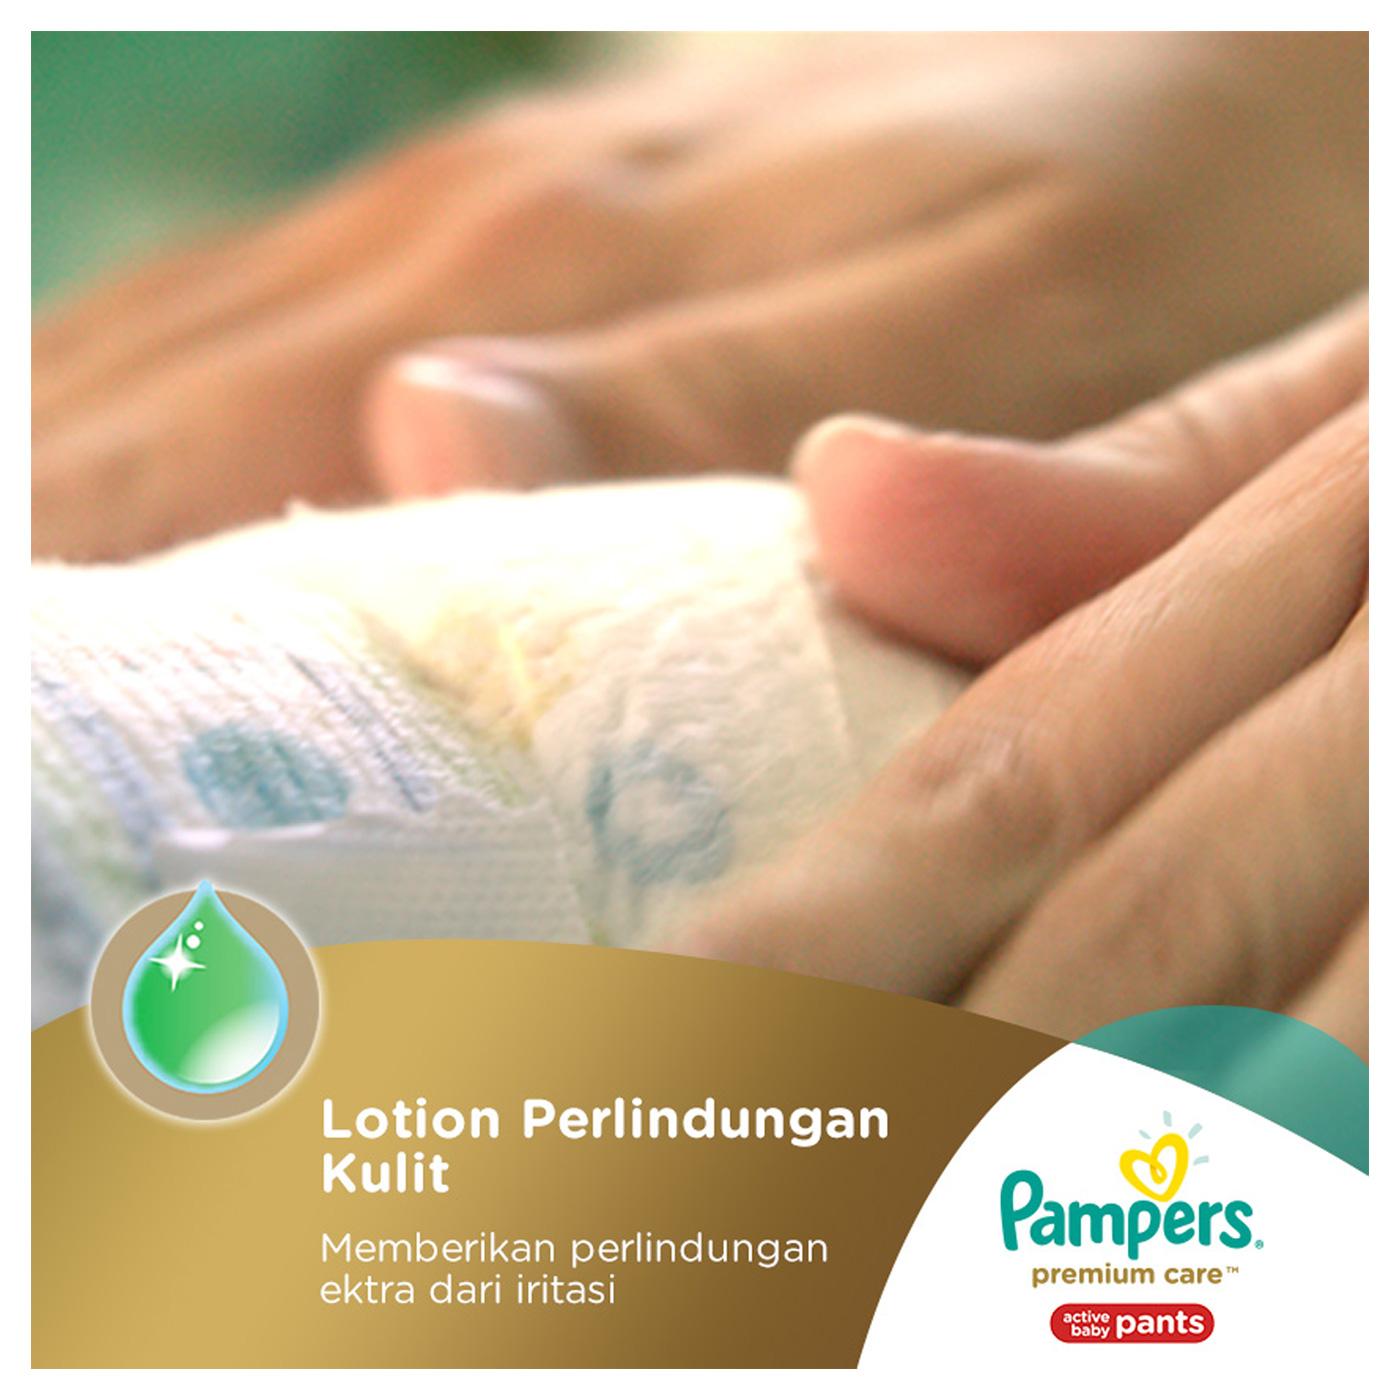 Pampers Popok Celana XL-36 Premium Care 4